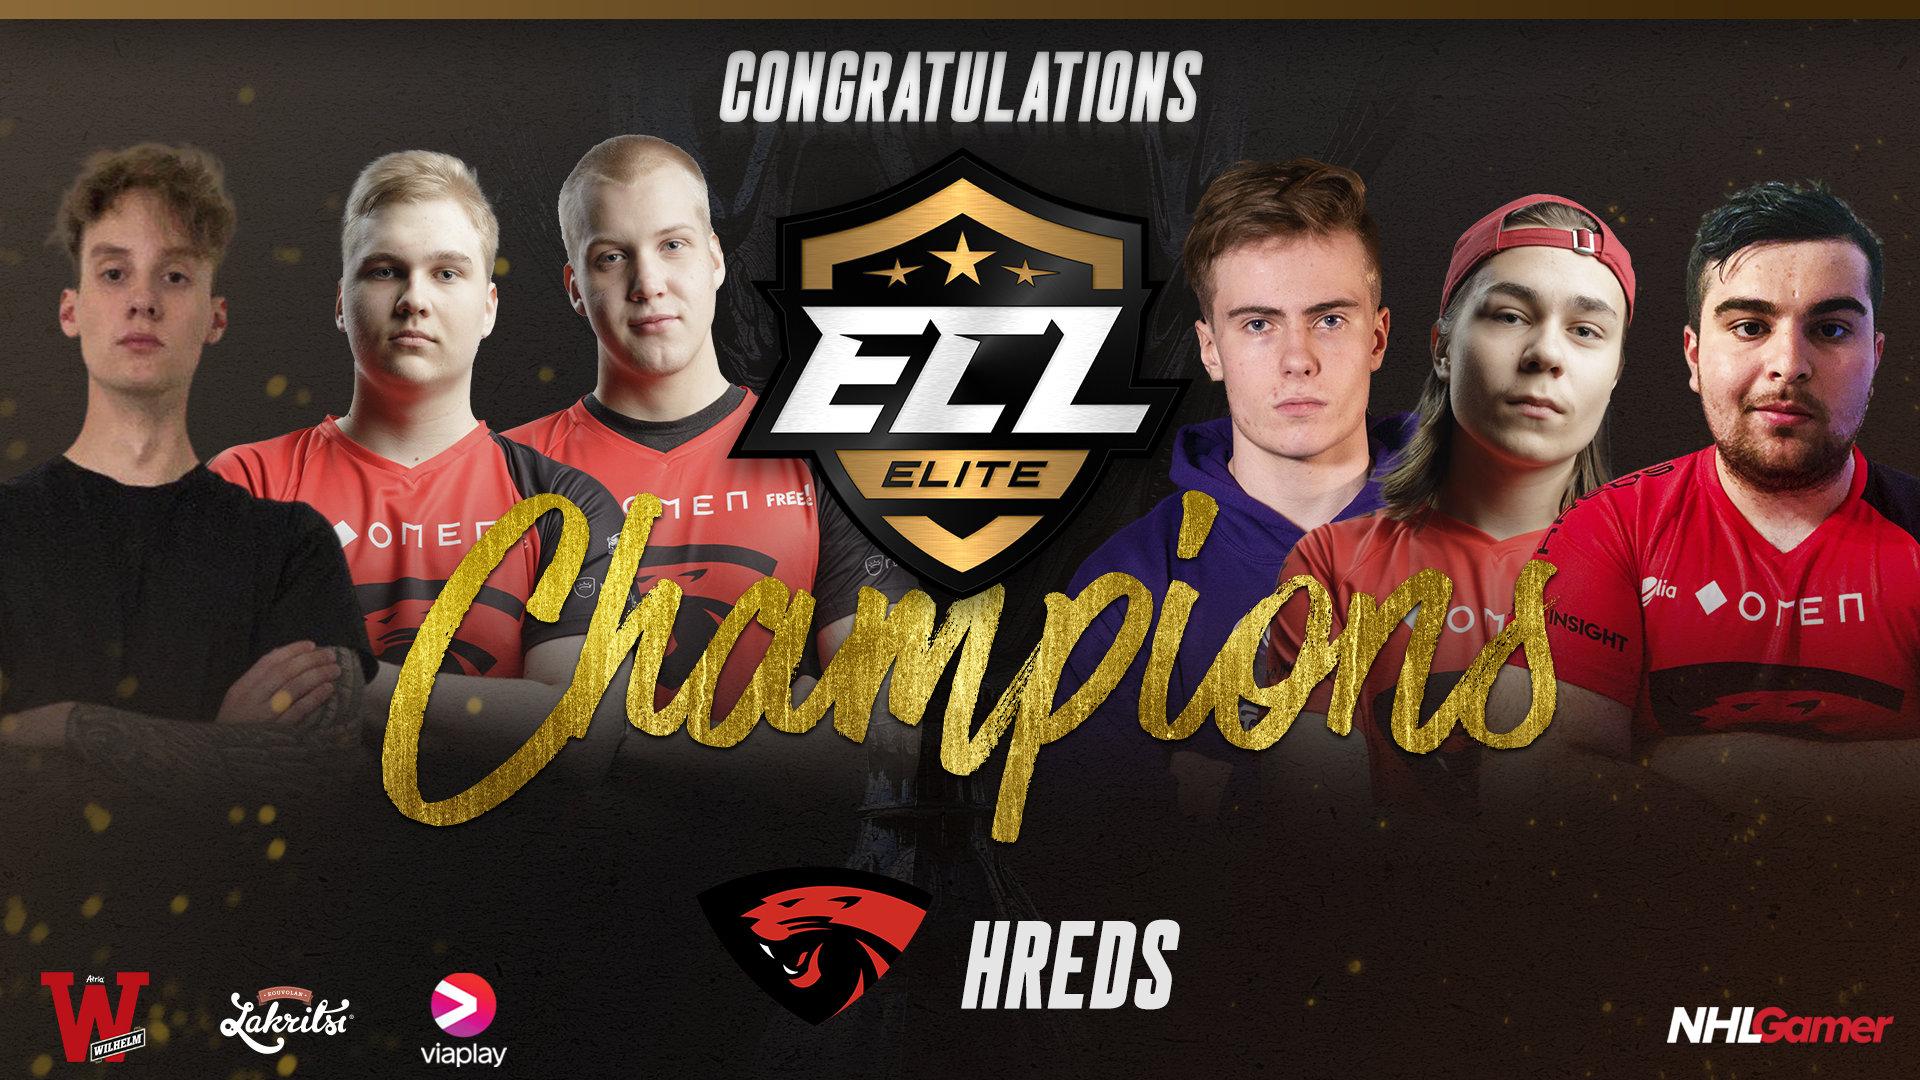 ECL_12_Elite_Champions_hREDS.jpg